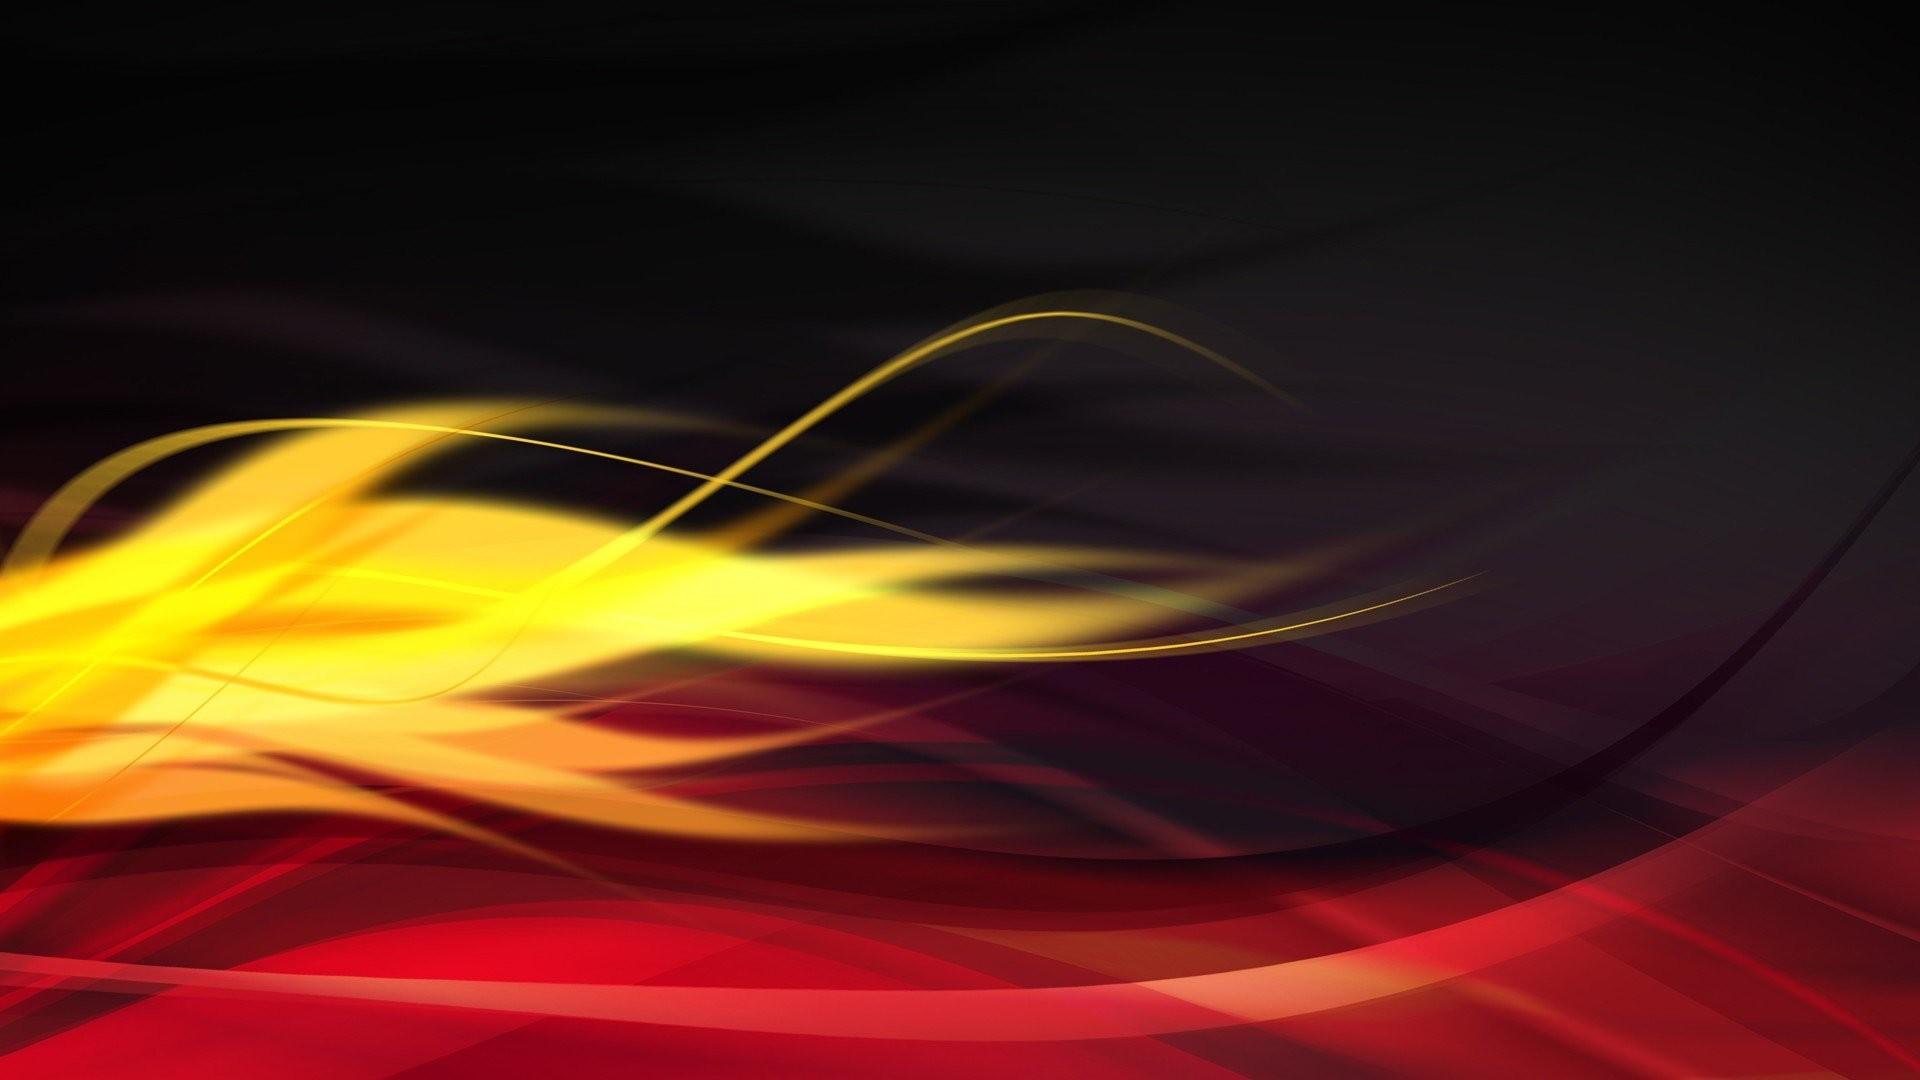 Abstract black digital art red flame wallpaper     293200    WallpaperUP